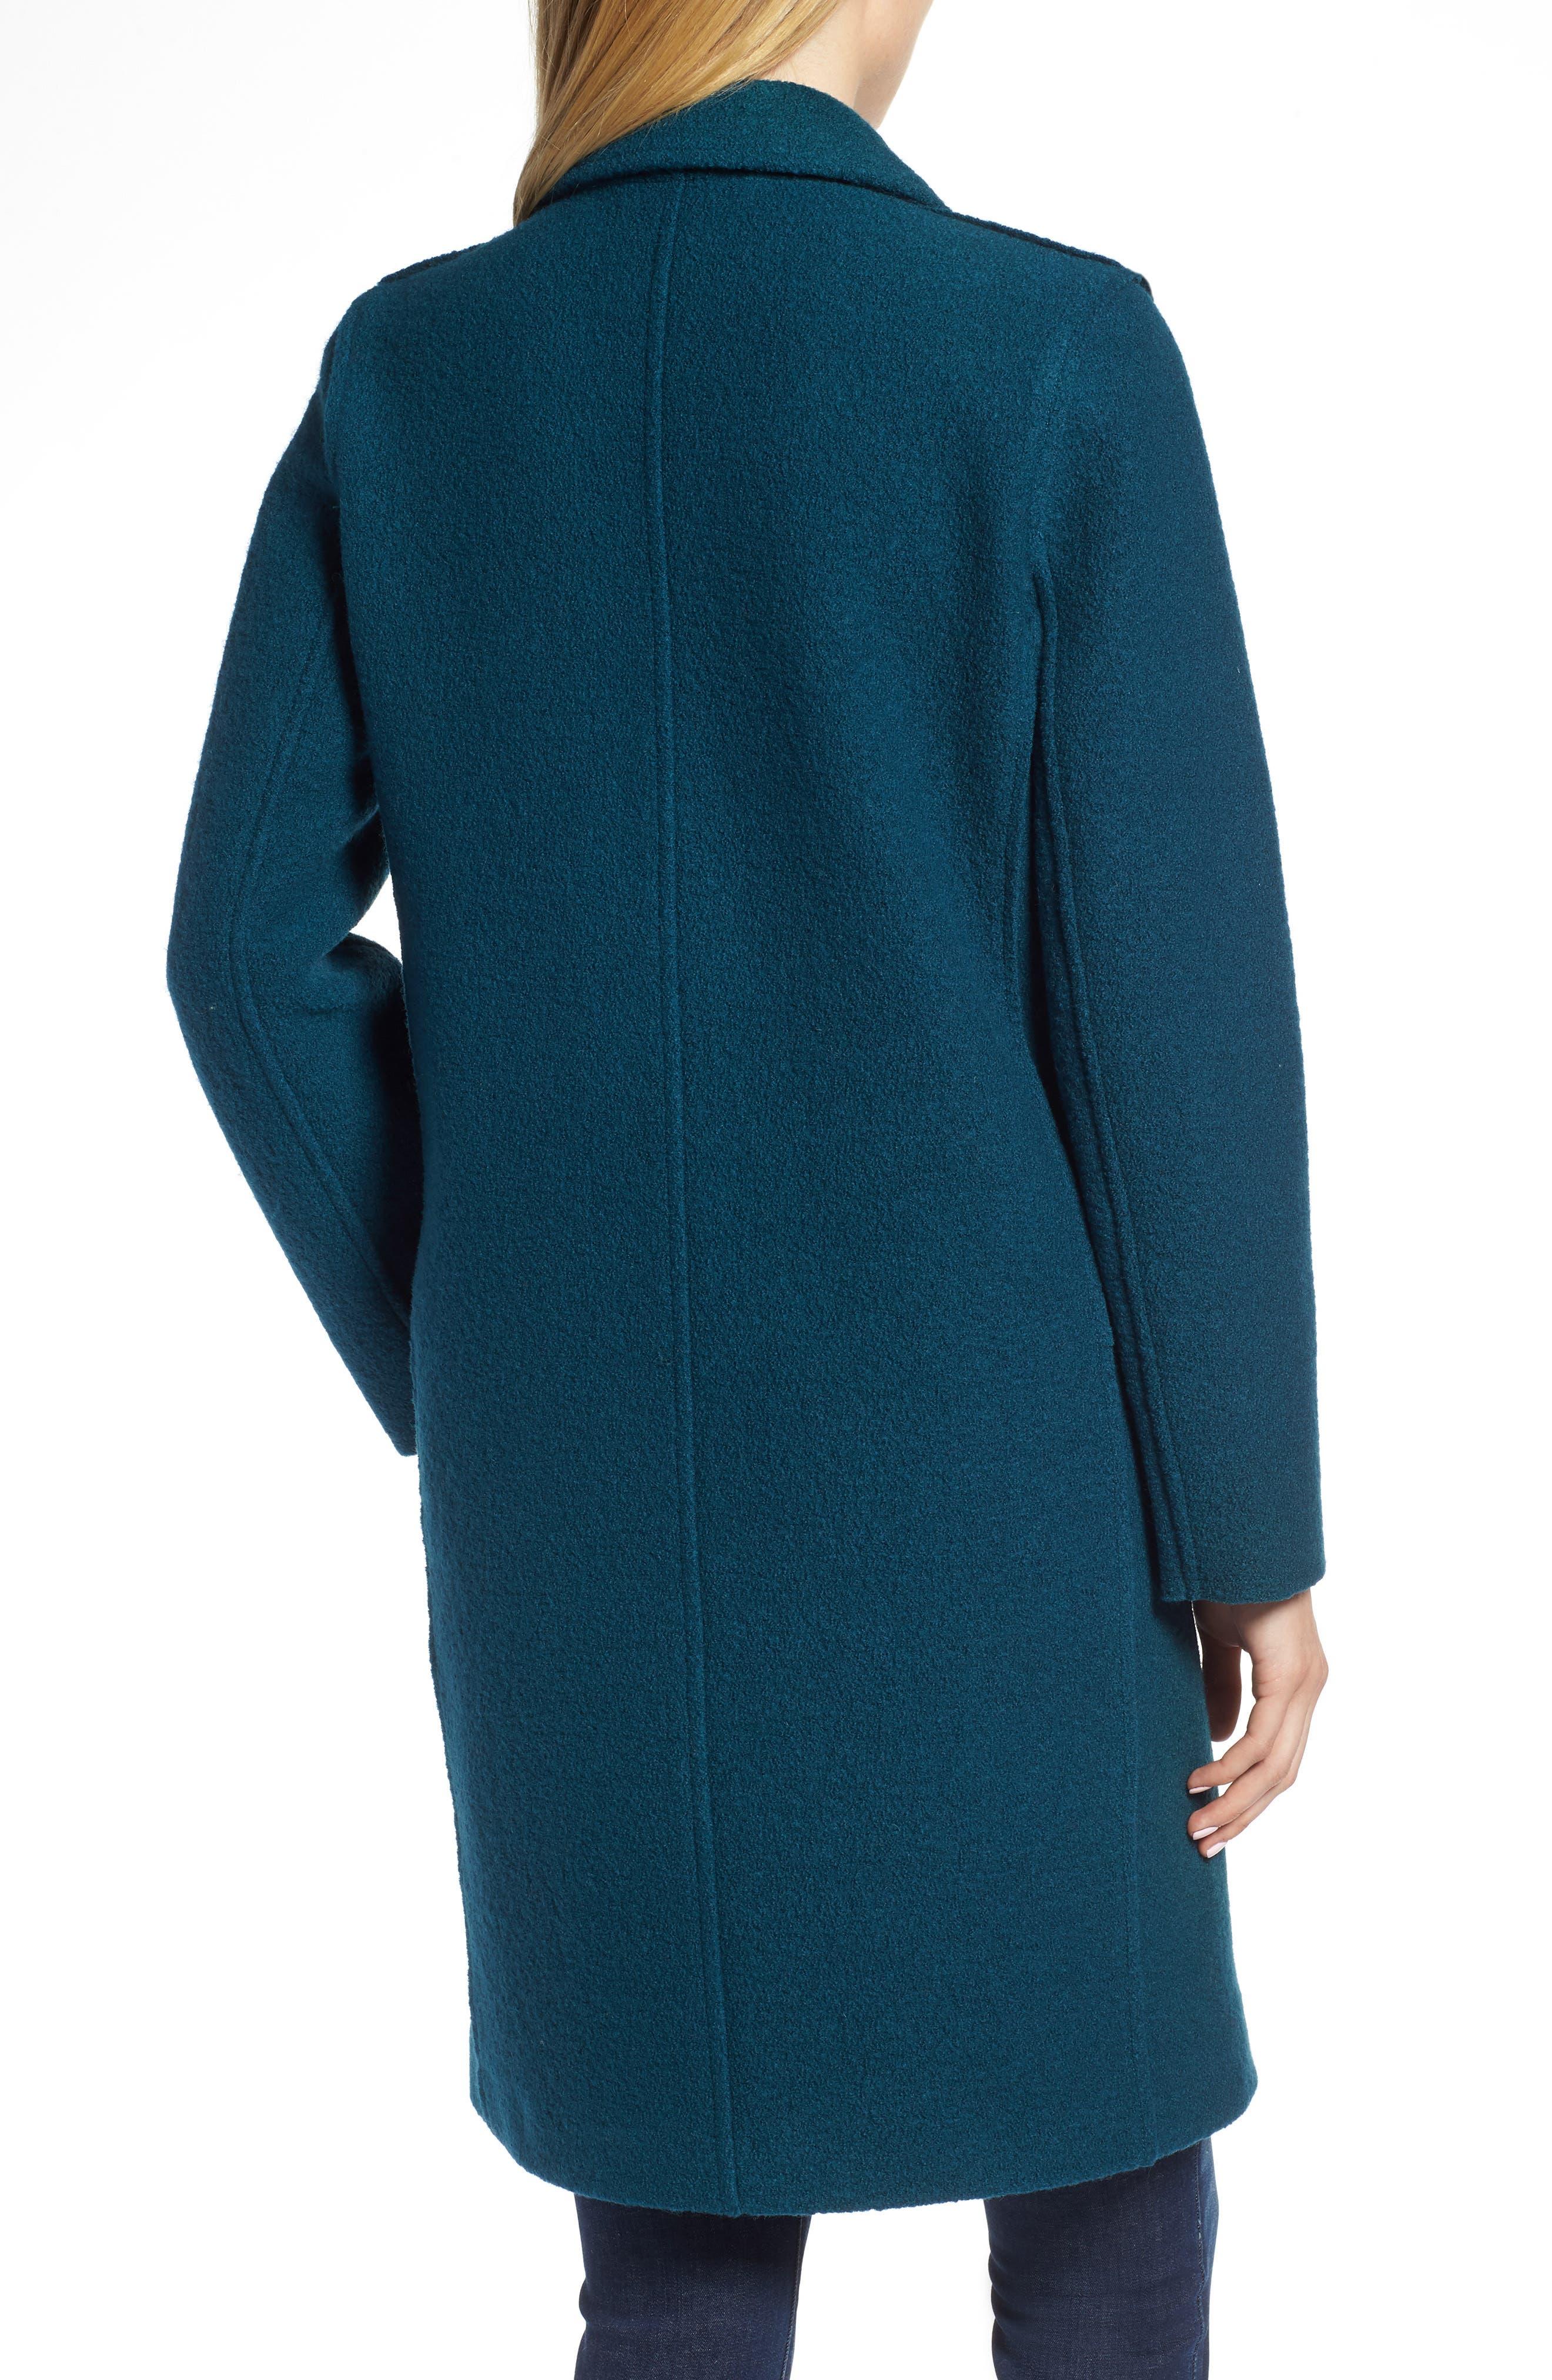 Olga Boiled Wool Topcoat,                             Alternate thumbnail 2, color,                             Winter Pine